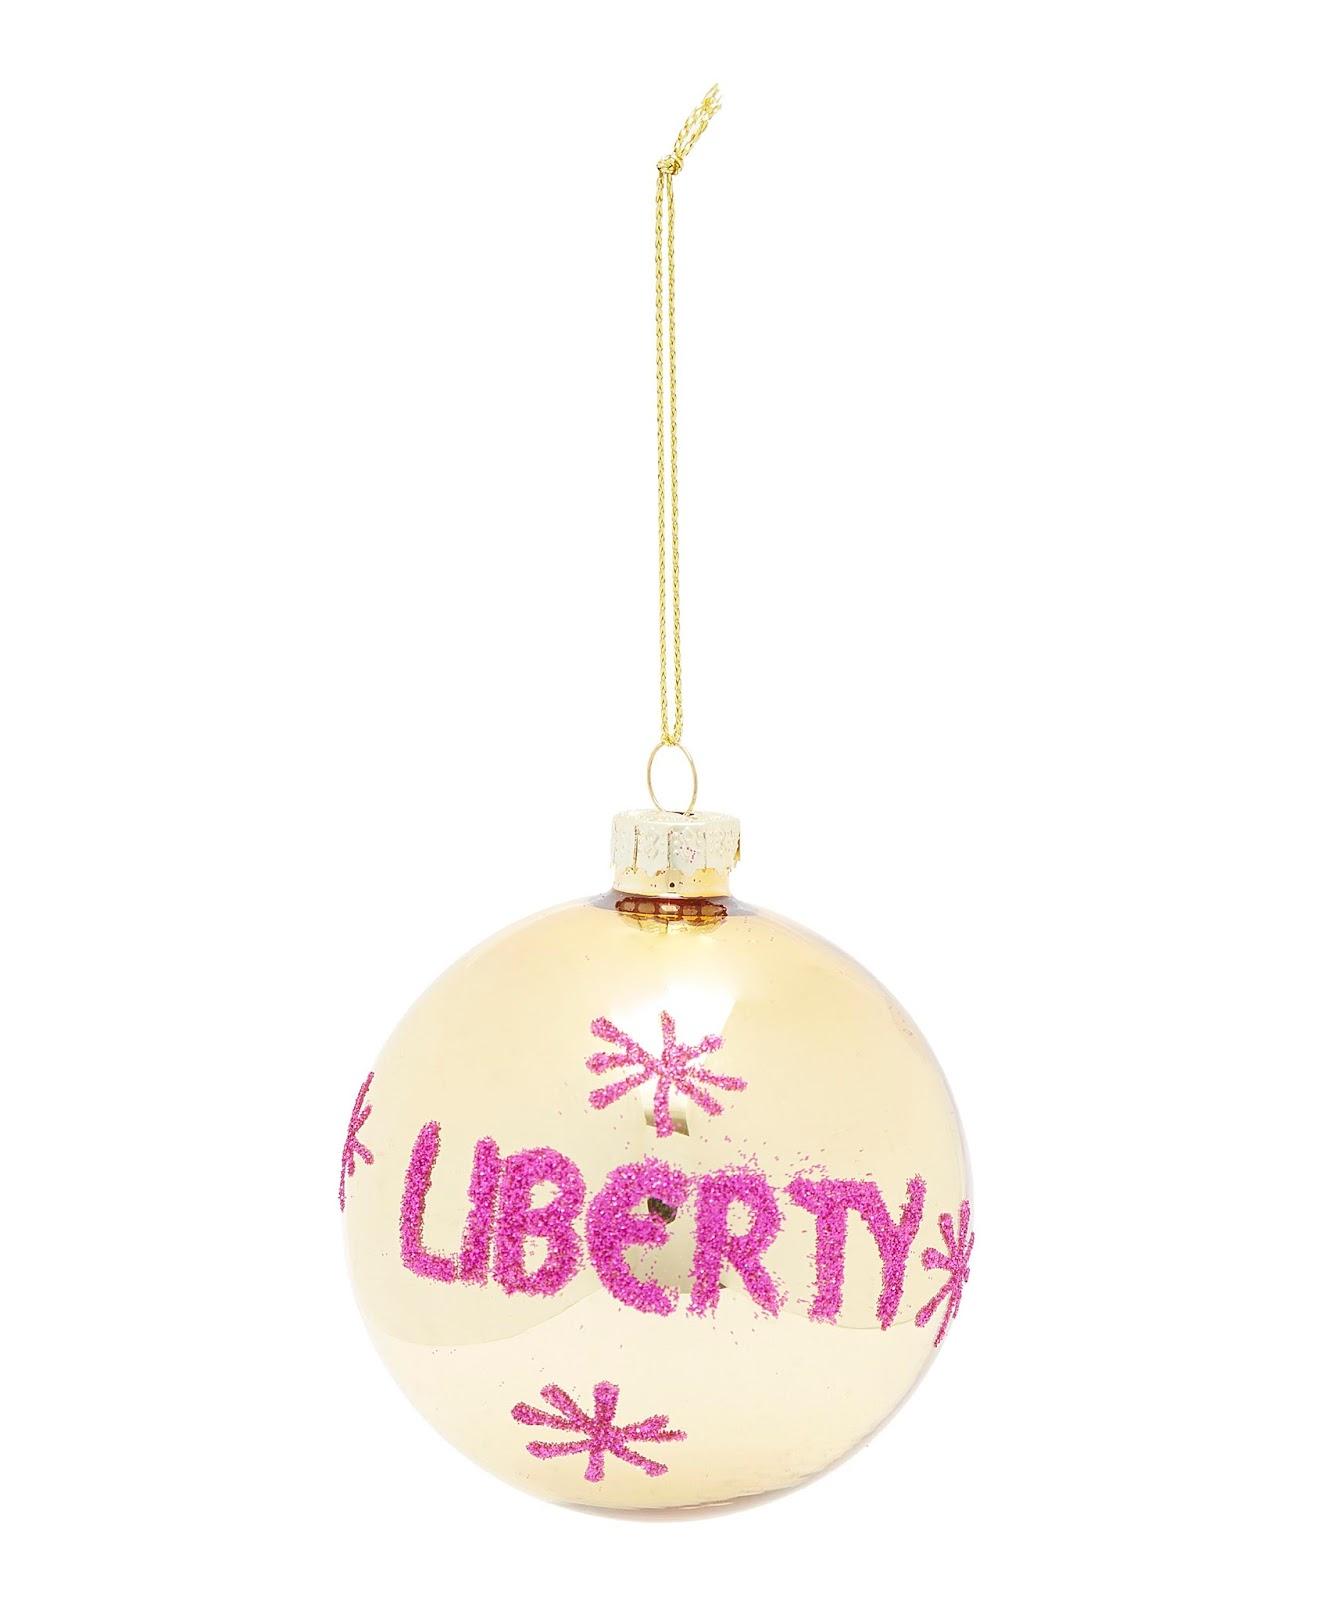 Satchel: Liberty London Christmas Tree Bauble 2017